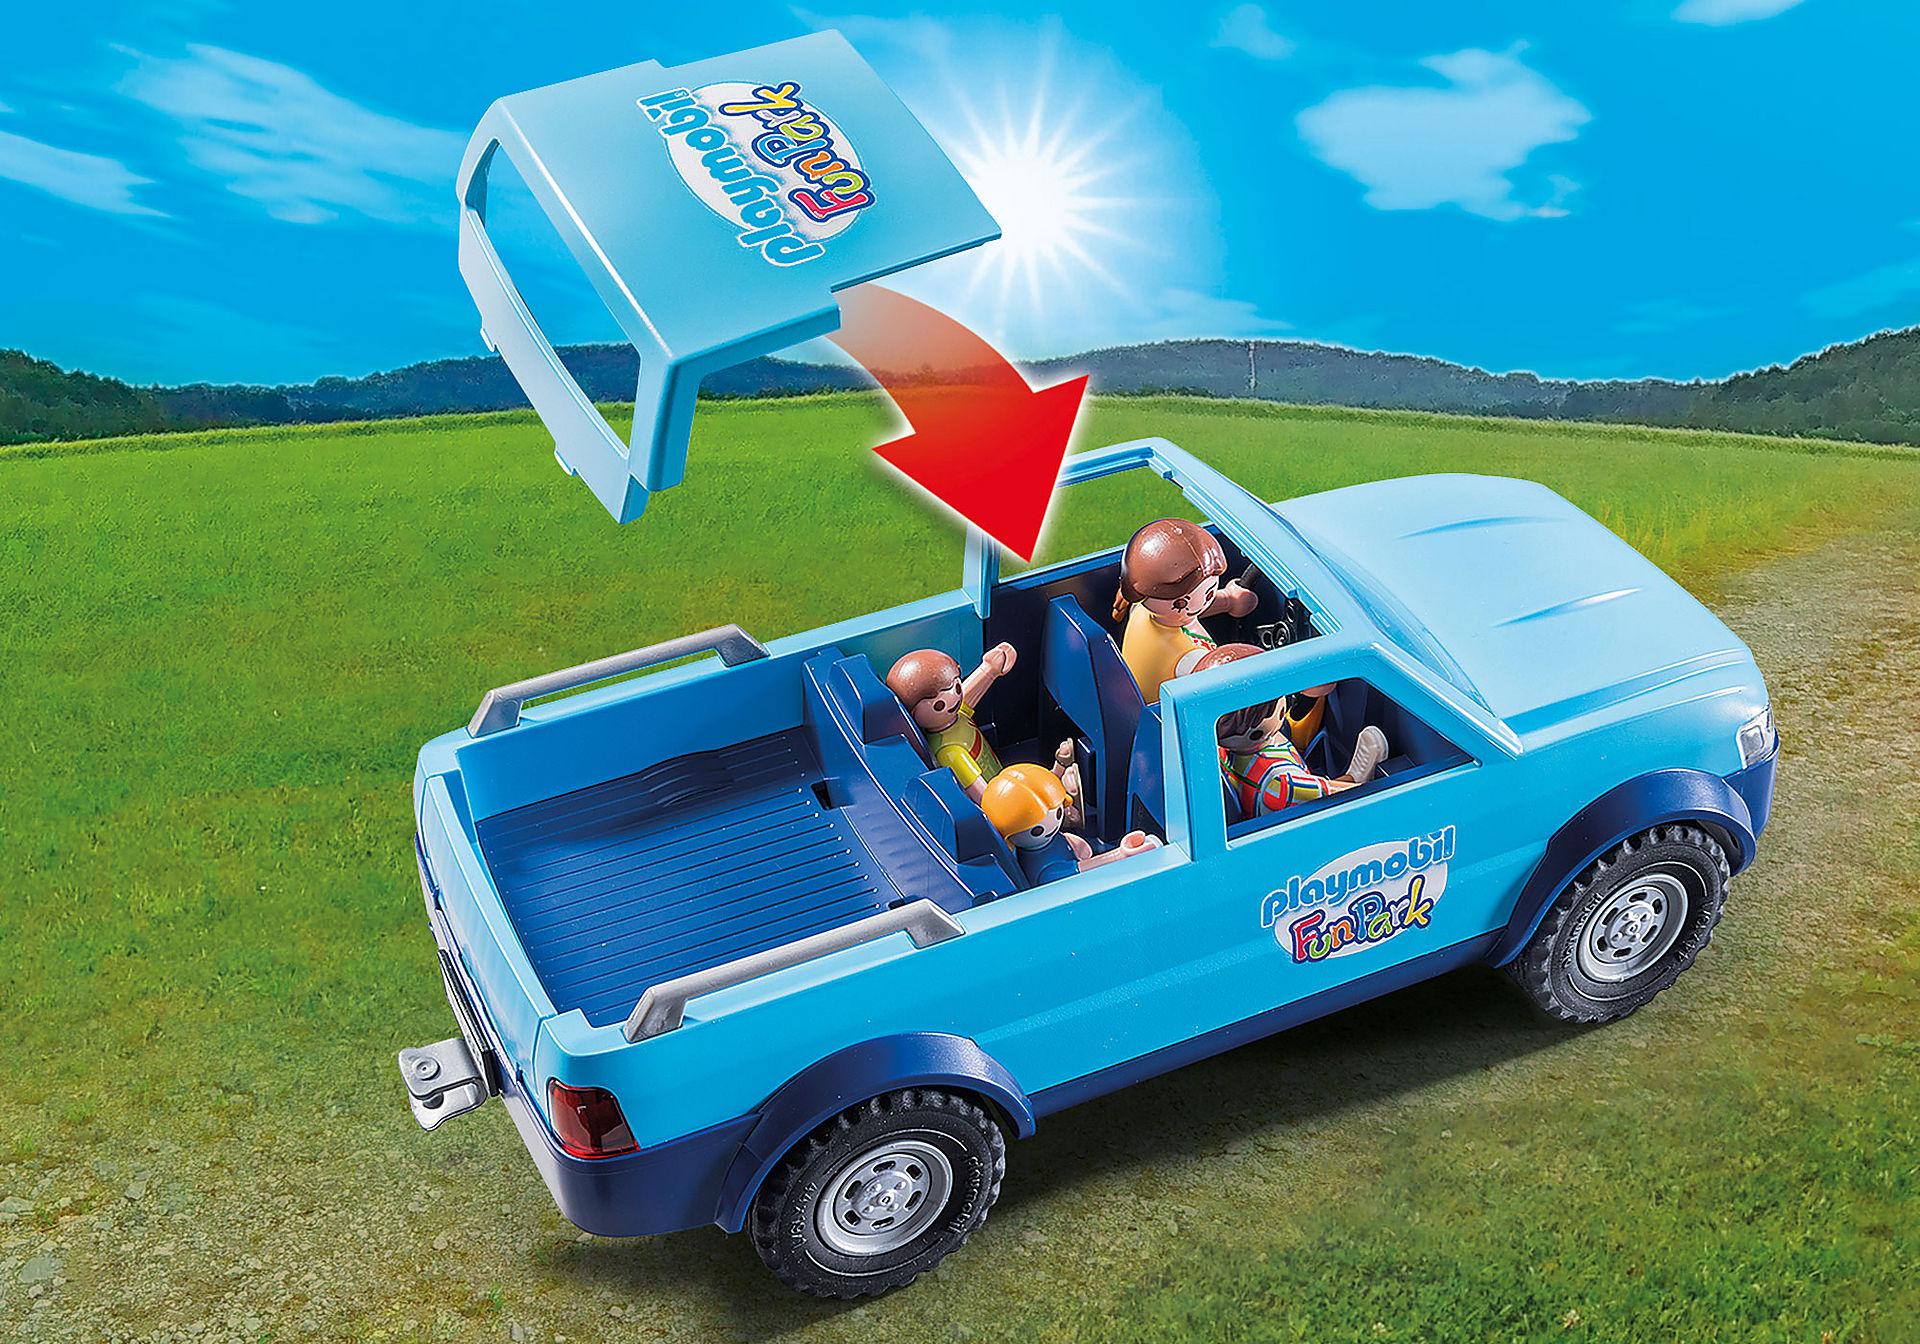 9502 PLAYMOBIL-FunPark Pickup med husvagn zoom image4